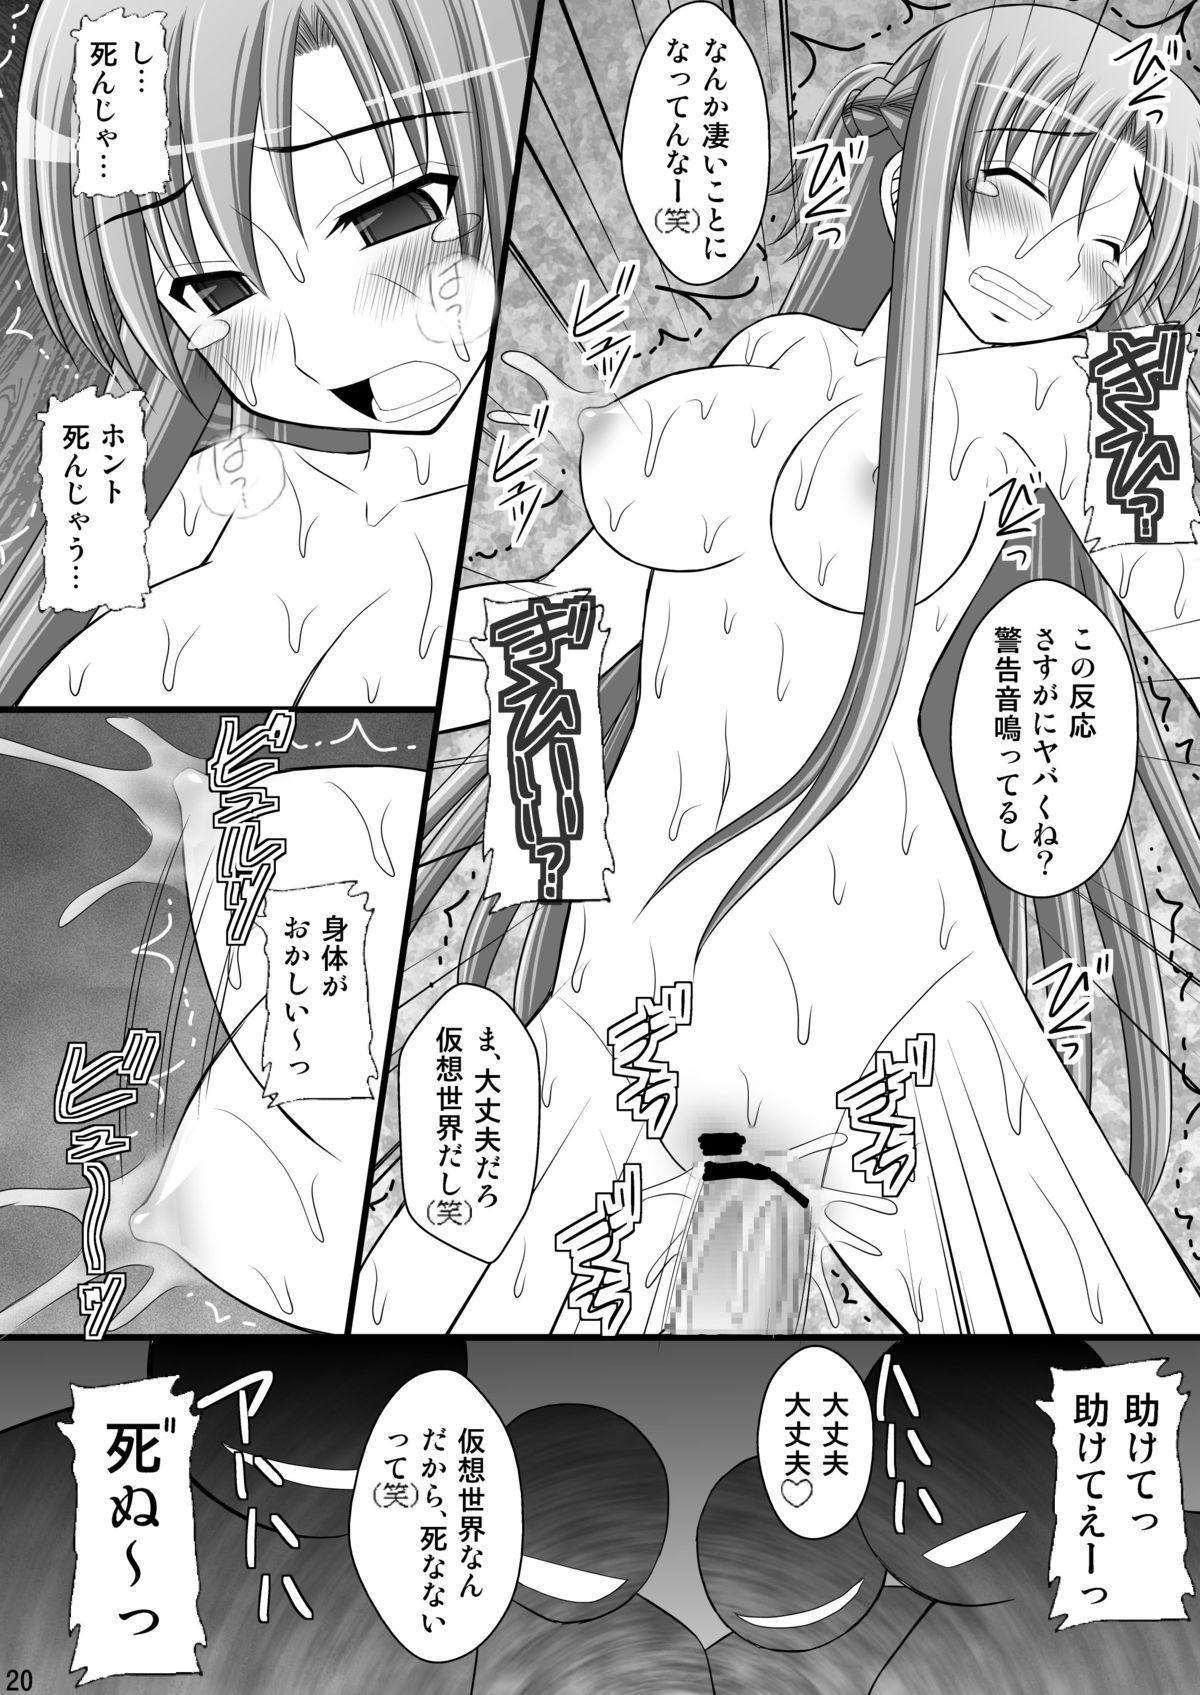 Toraware Hime III: Hostage Princess III 18